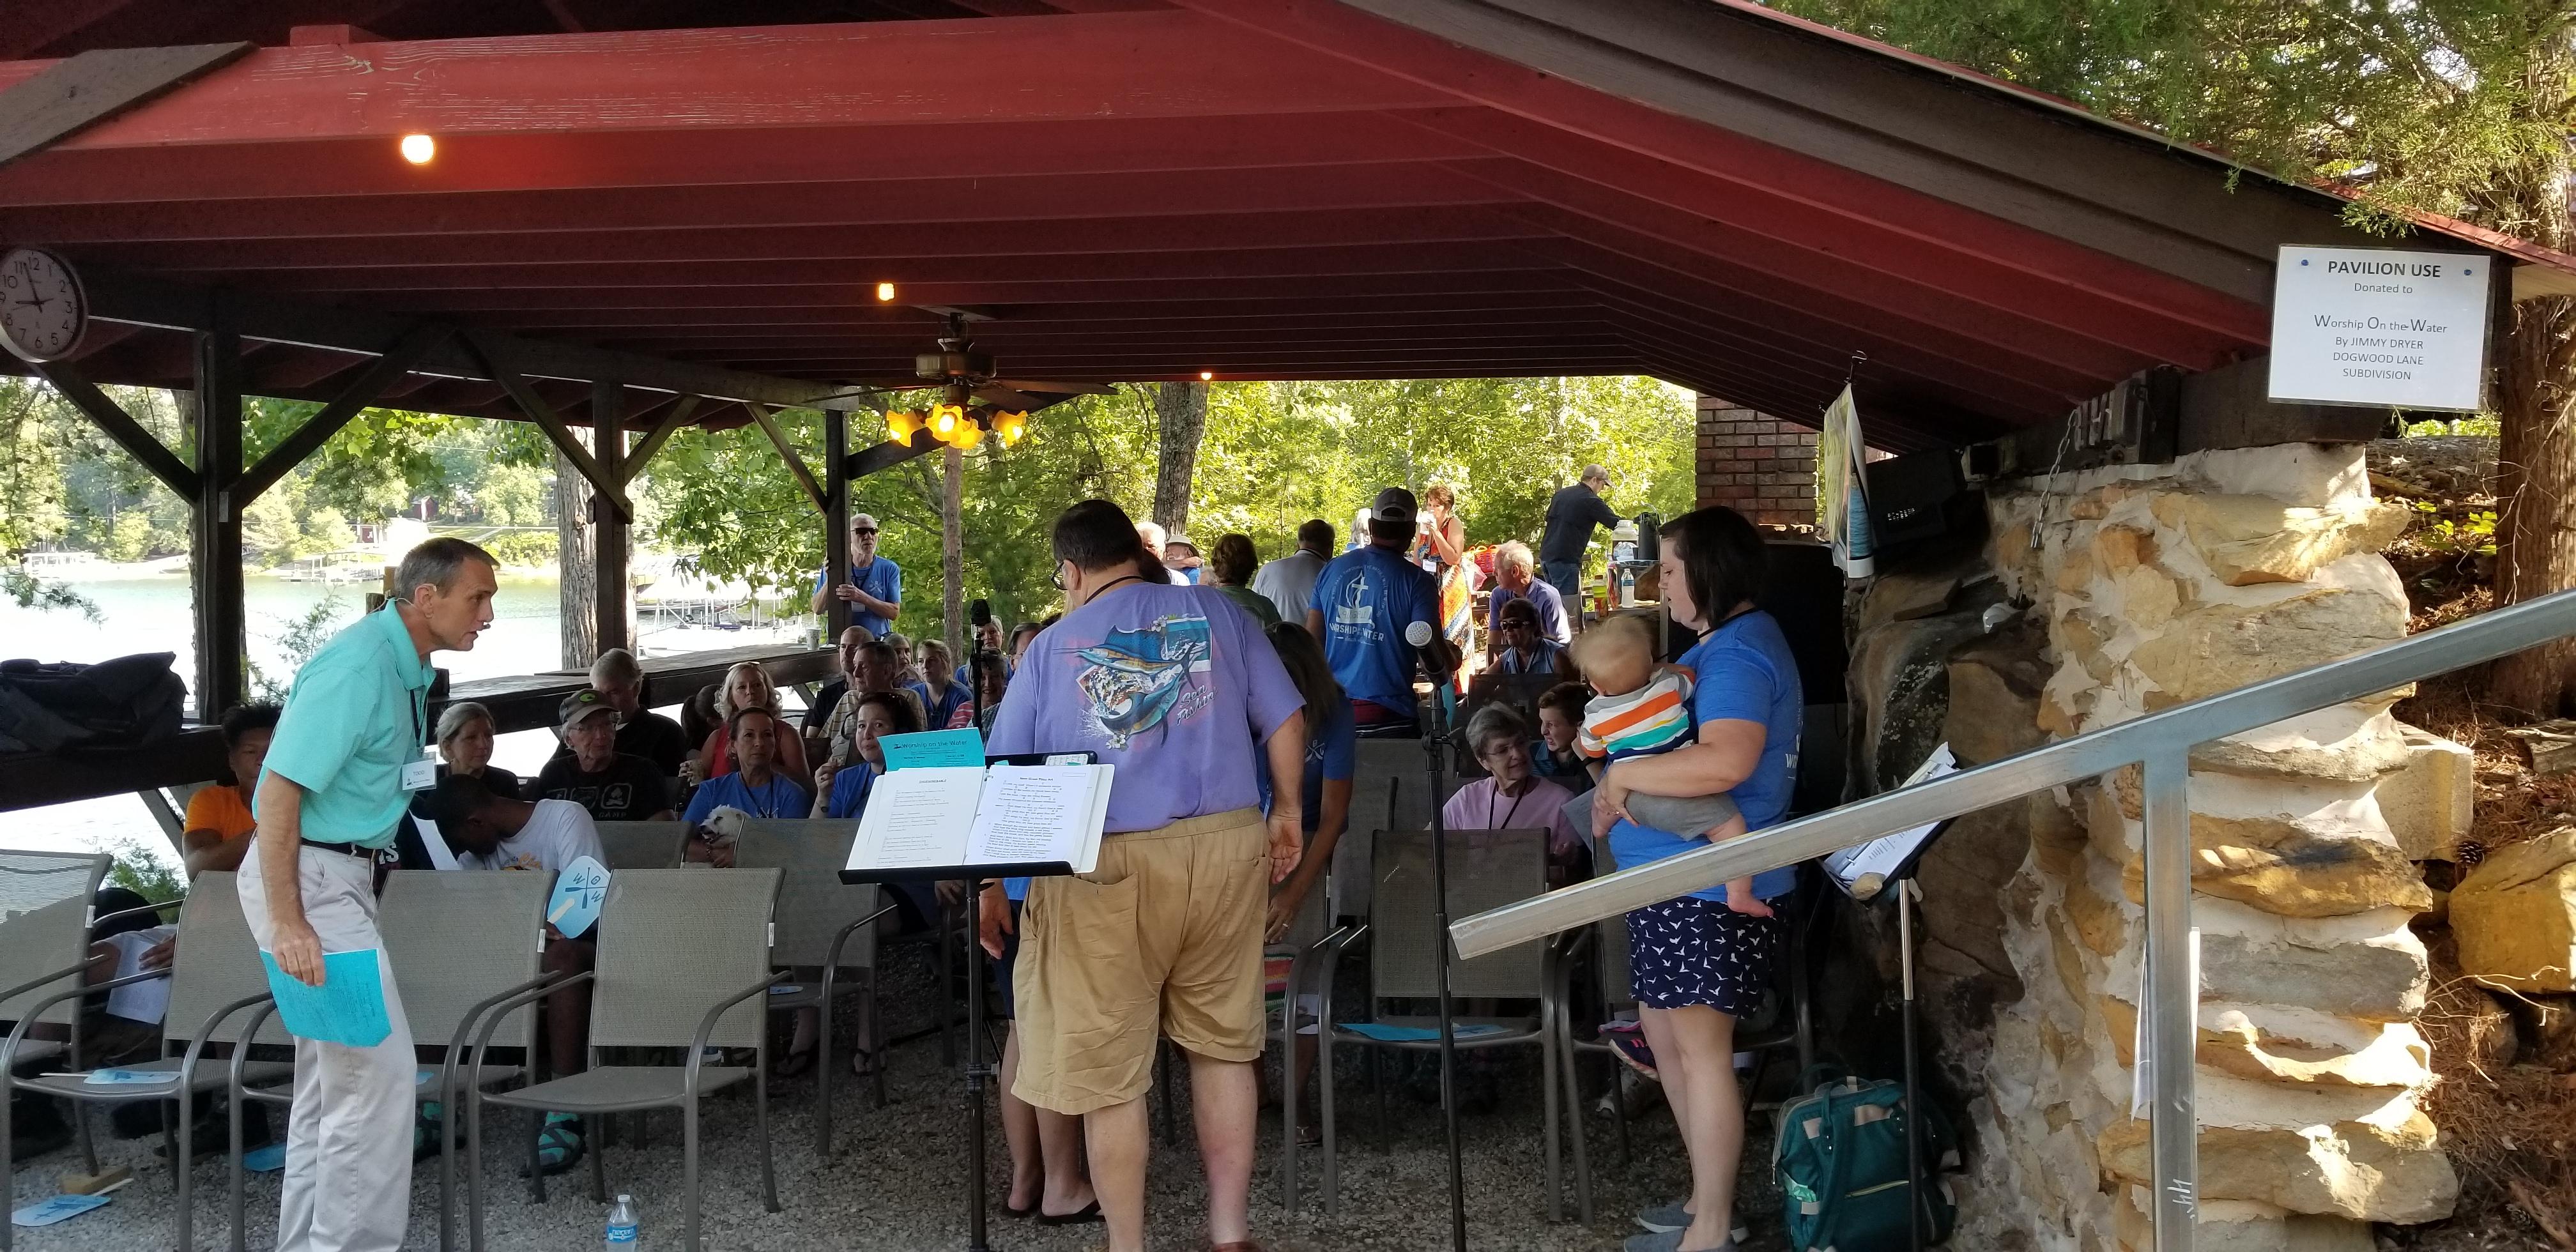 Gathering, July 22, 2018